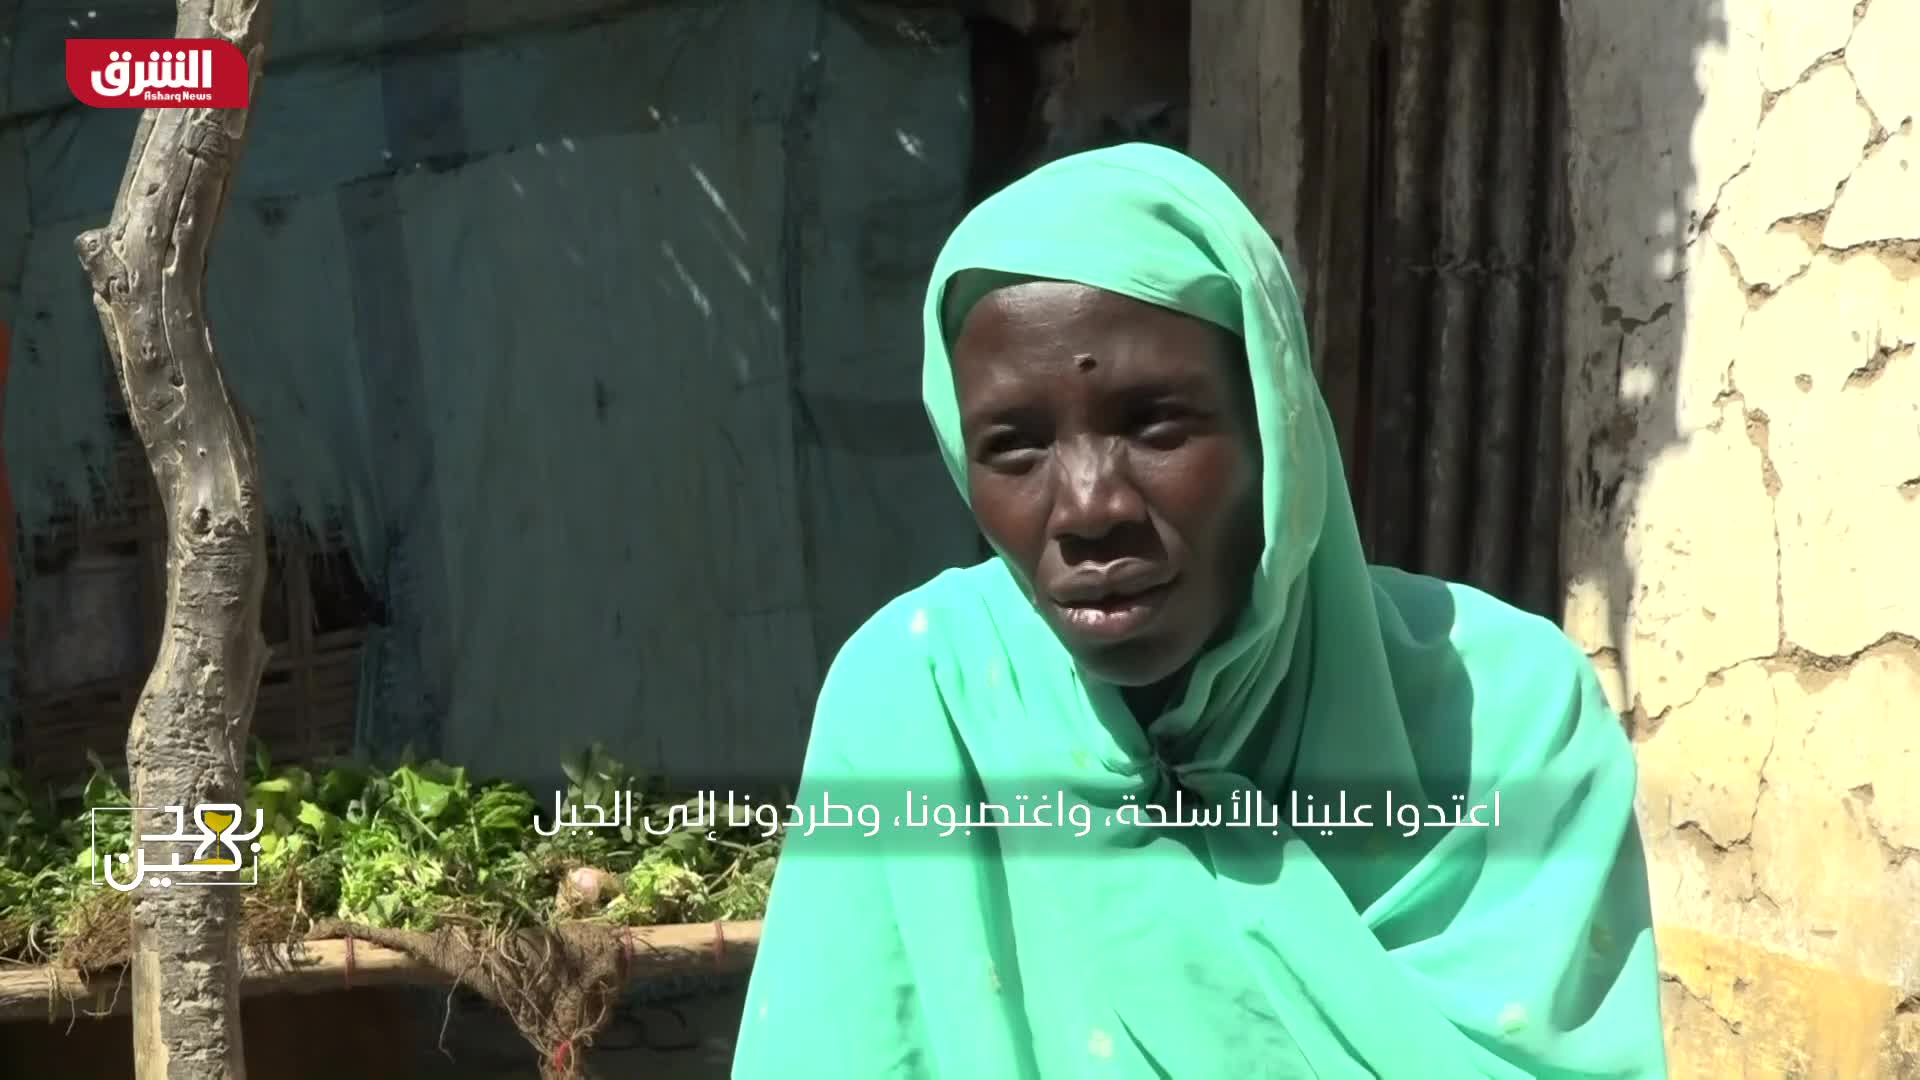 انتهاكات دارفور